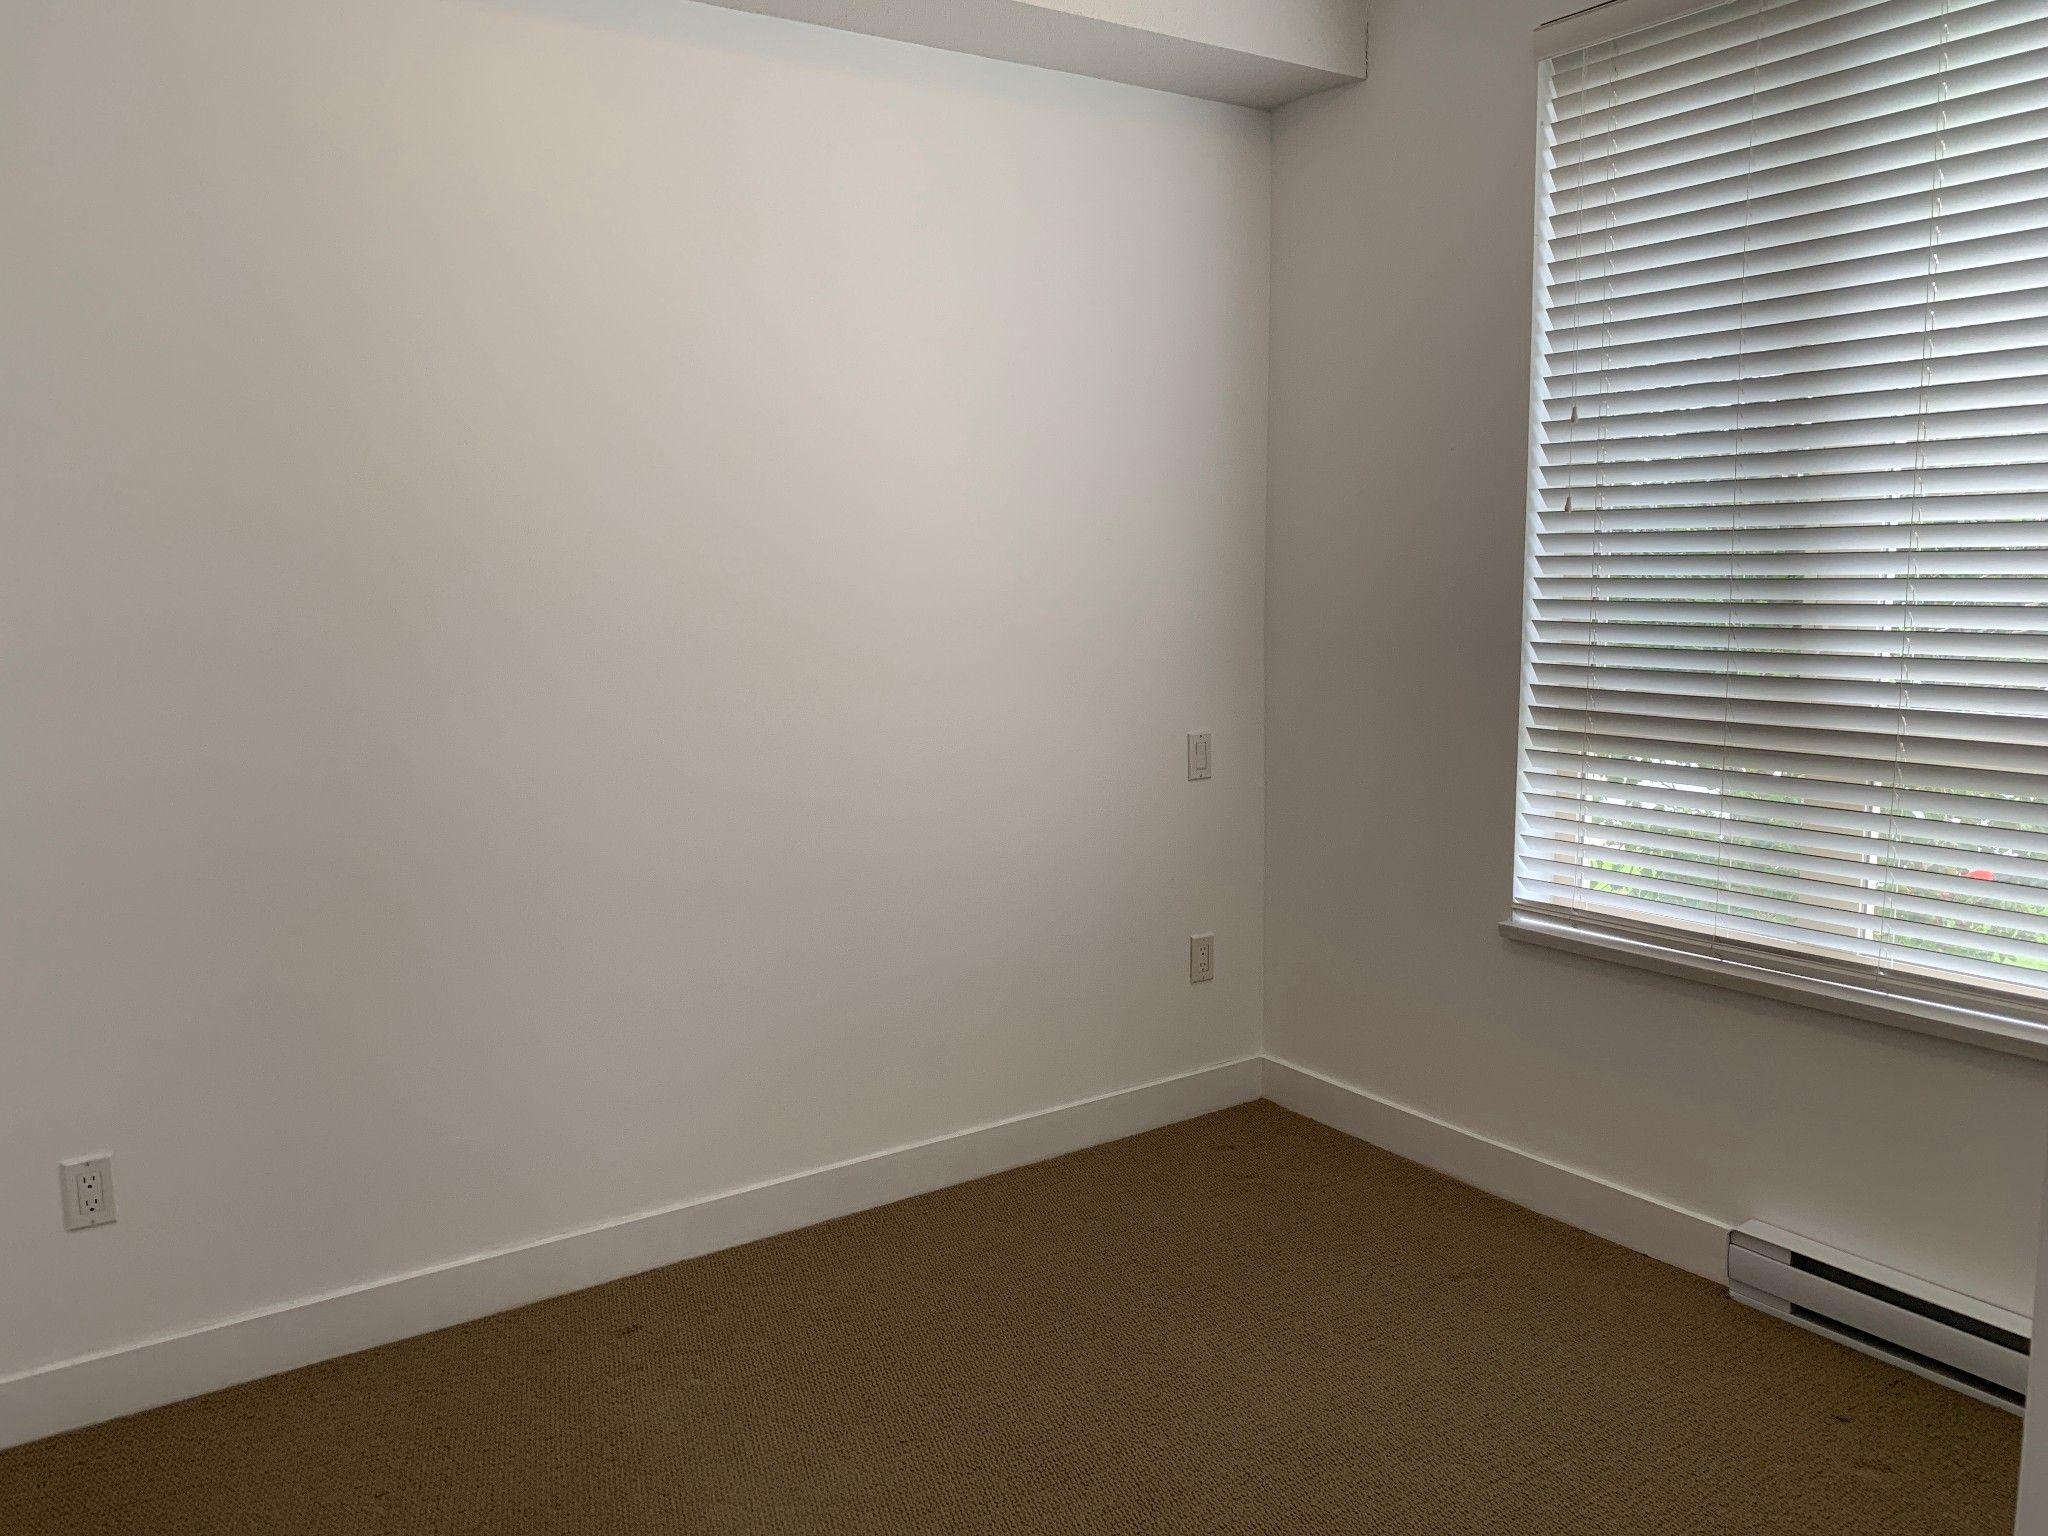 Photo 7: Photos: #212 20460 Douglas Crescent in Langley: Condo for rent